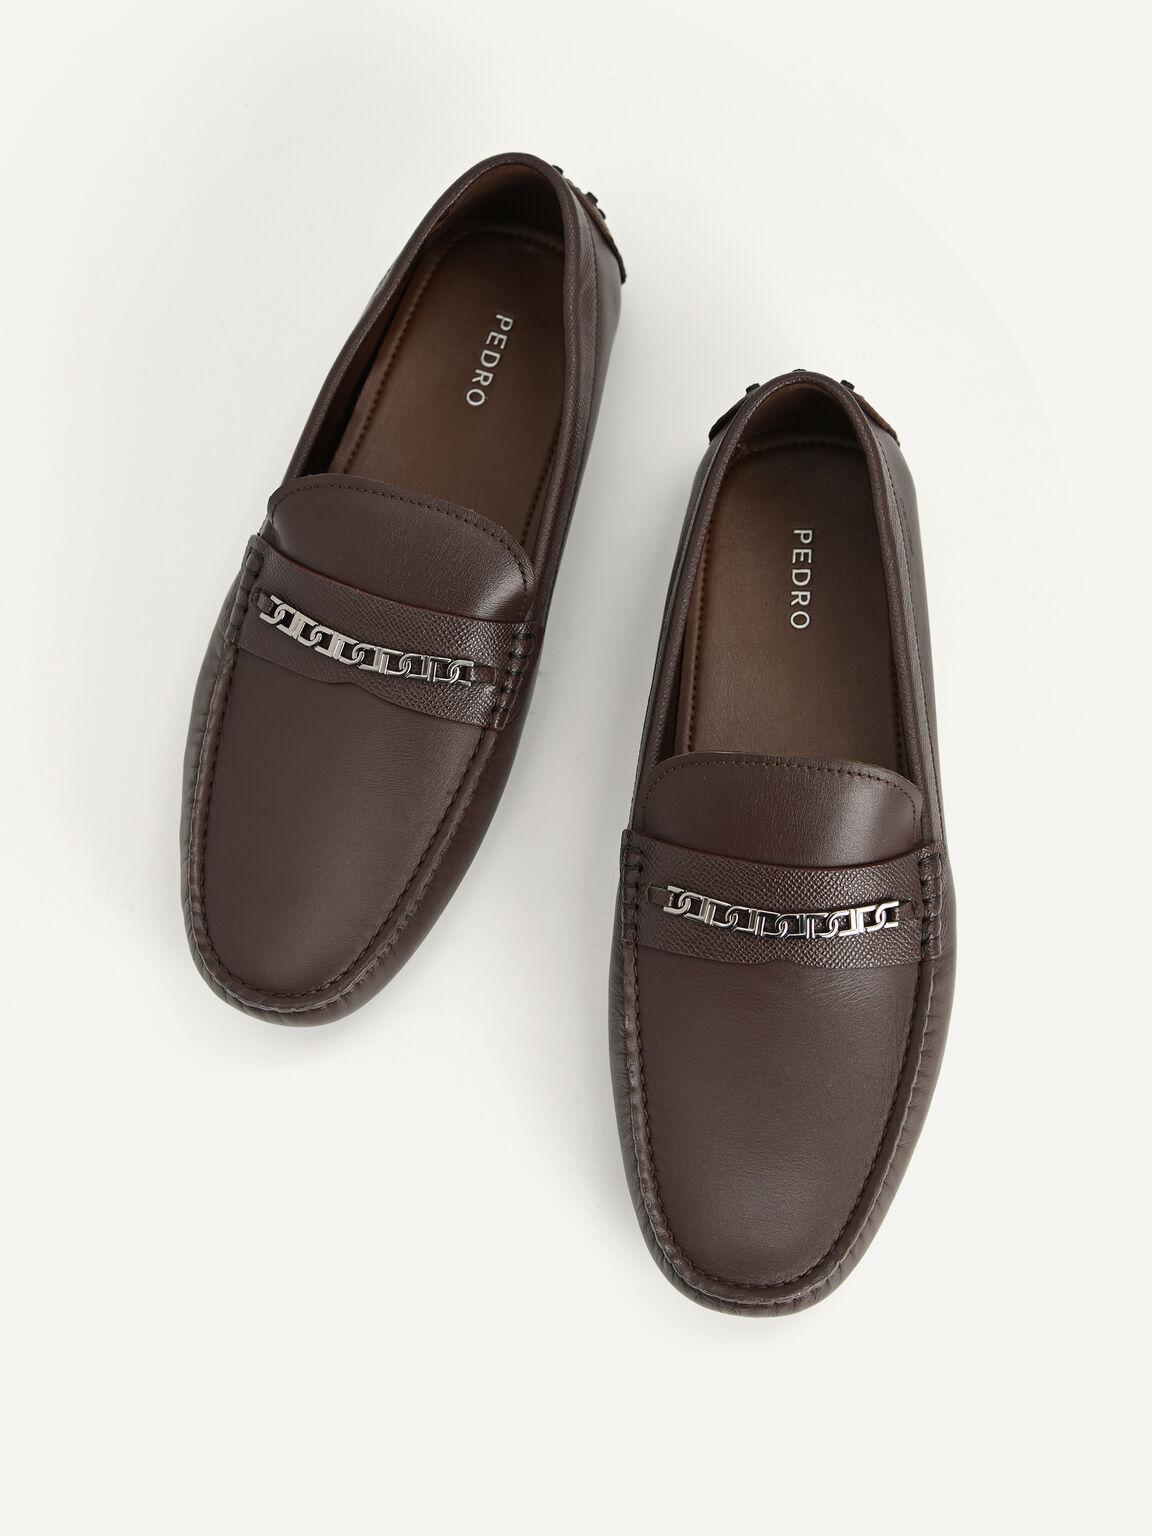 Icon leather Moccasins, Dark Brown, hi-res